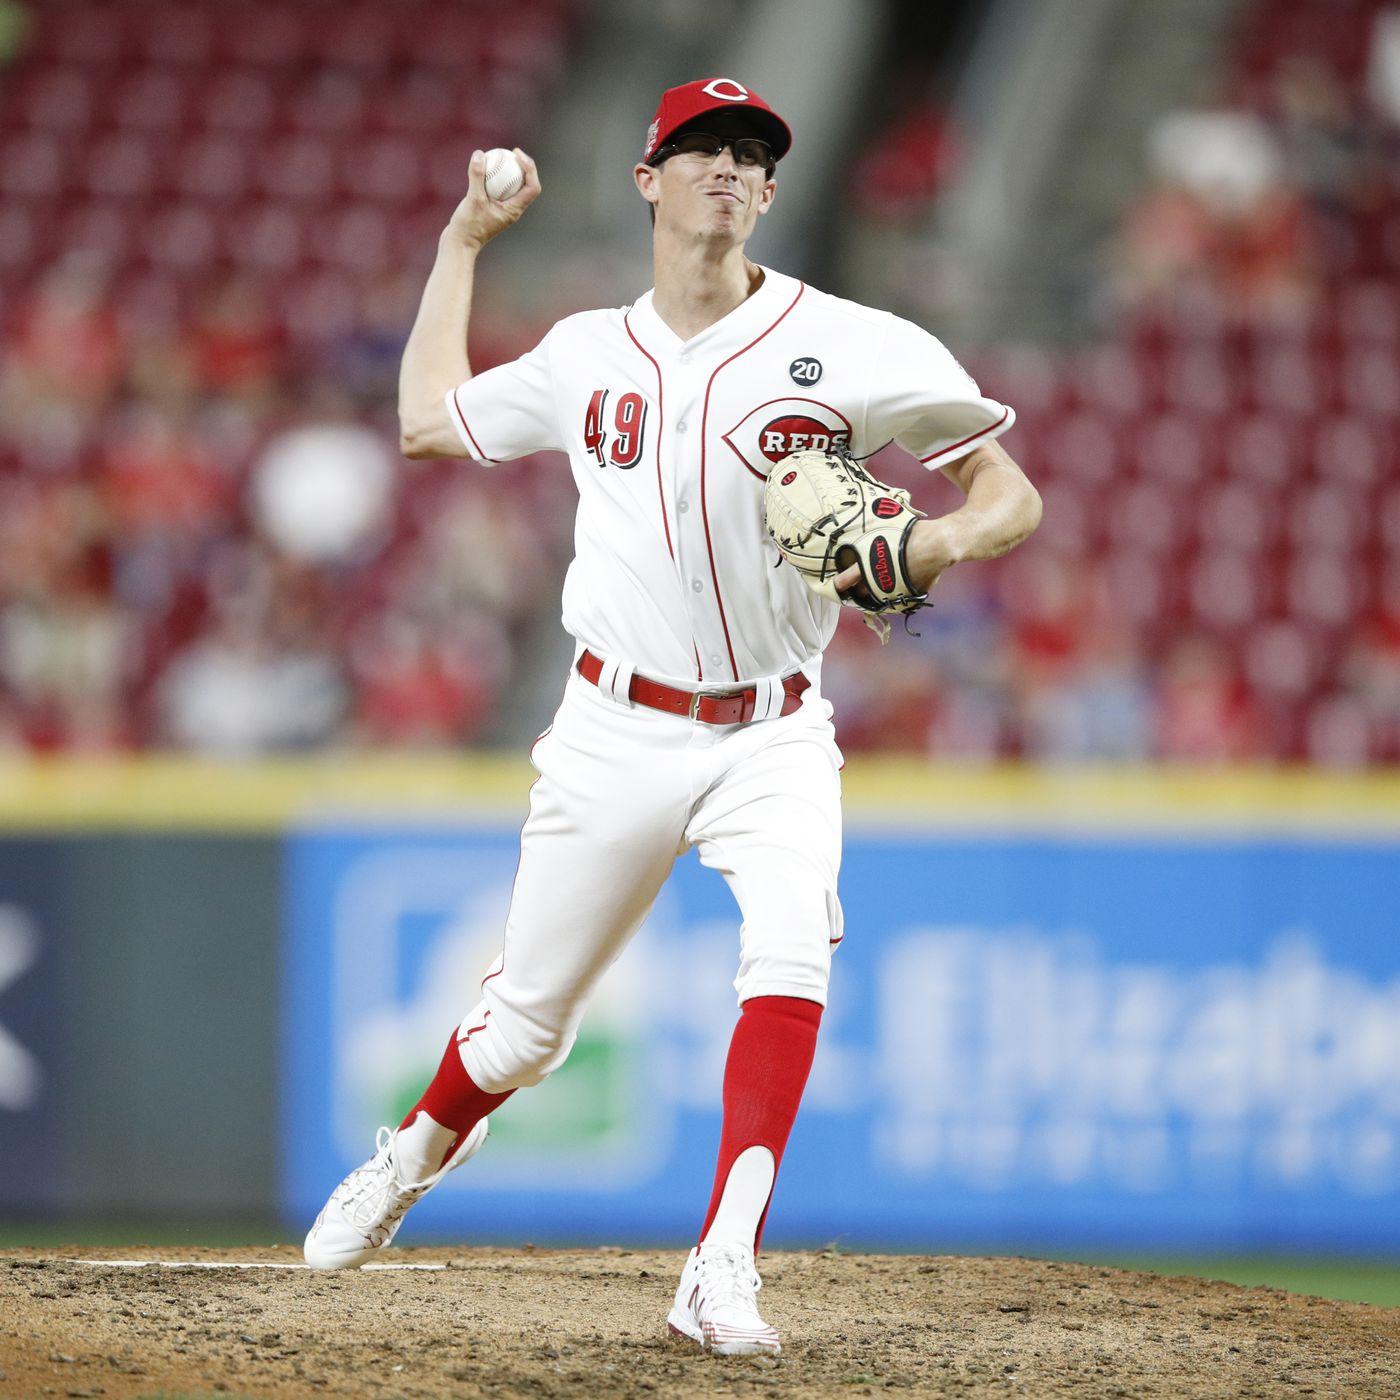 Jimmy Herget MLB Debut July 7, 2019